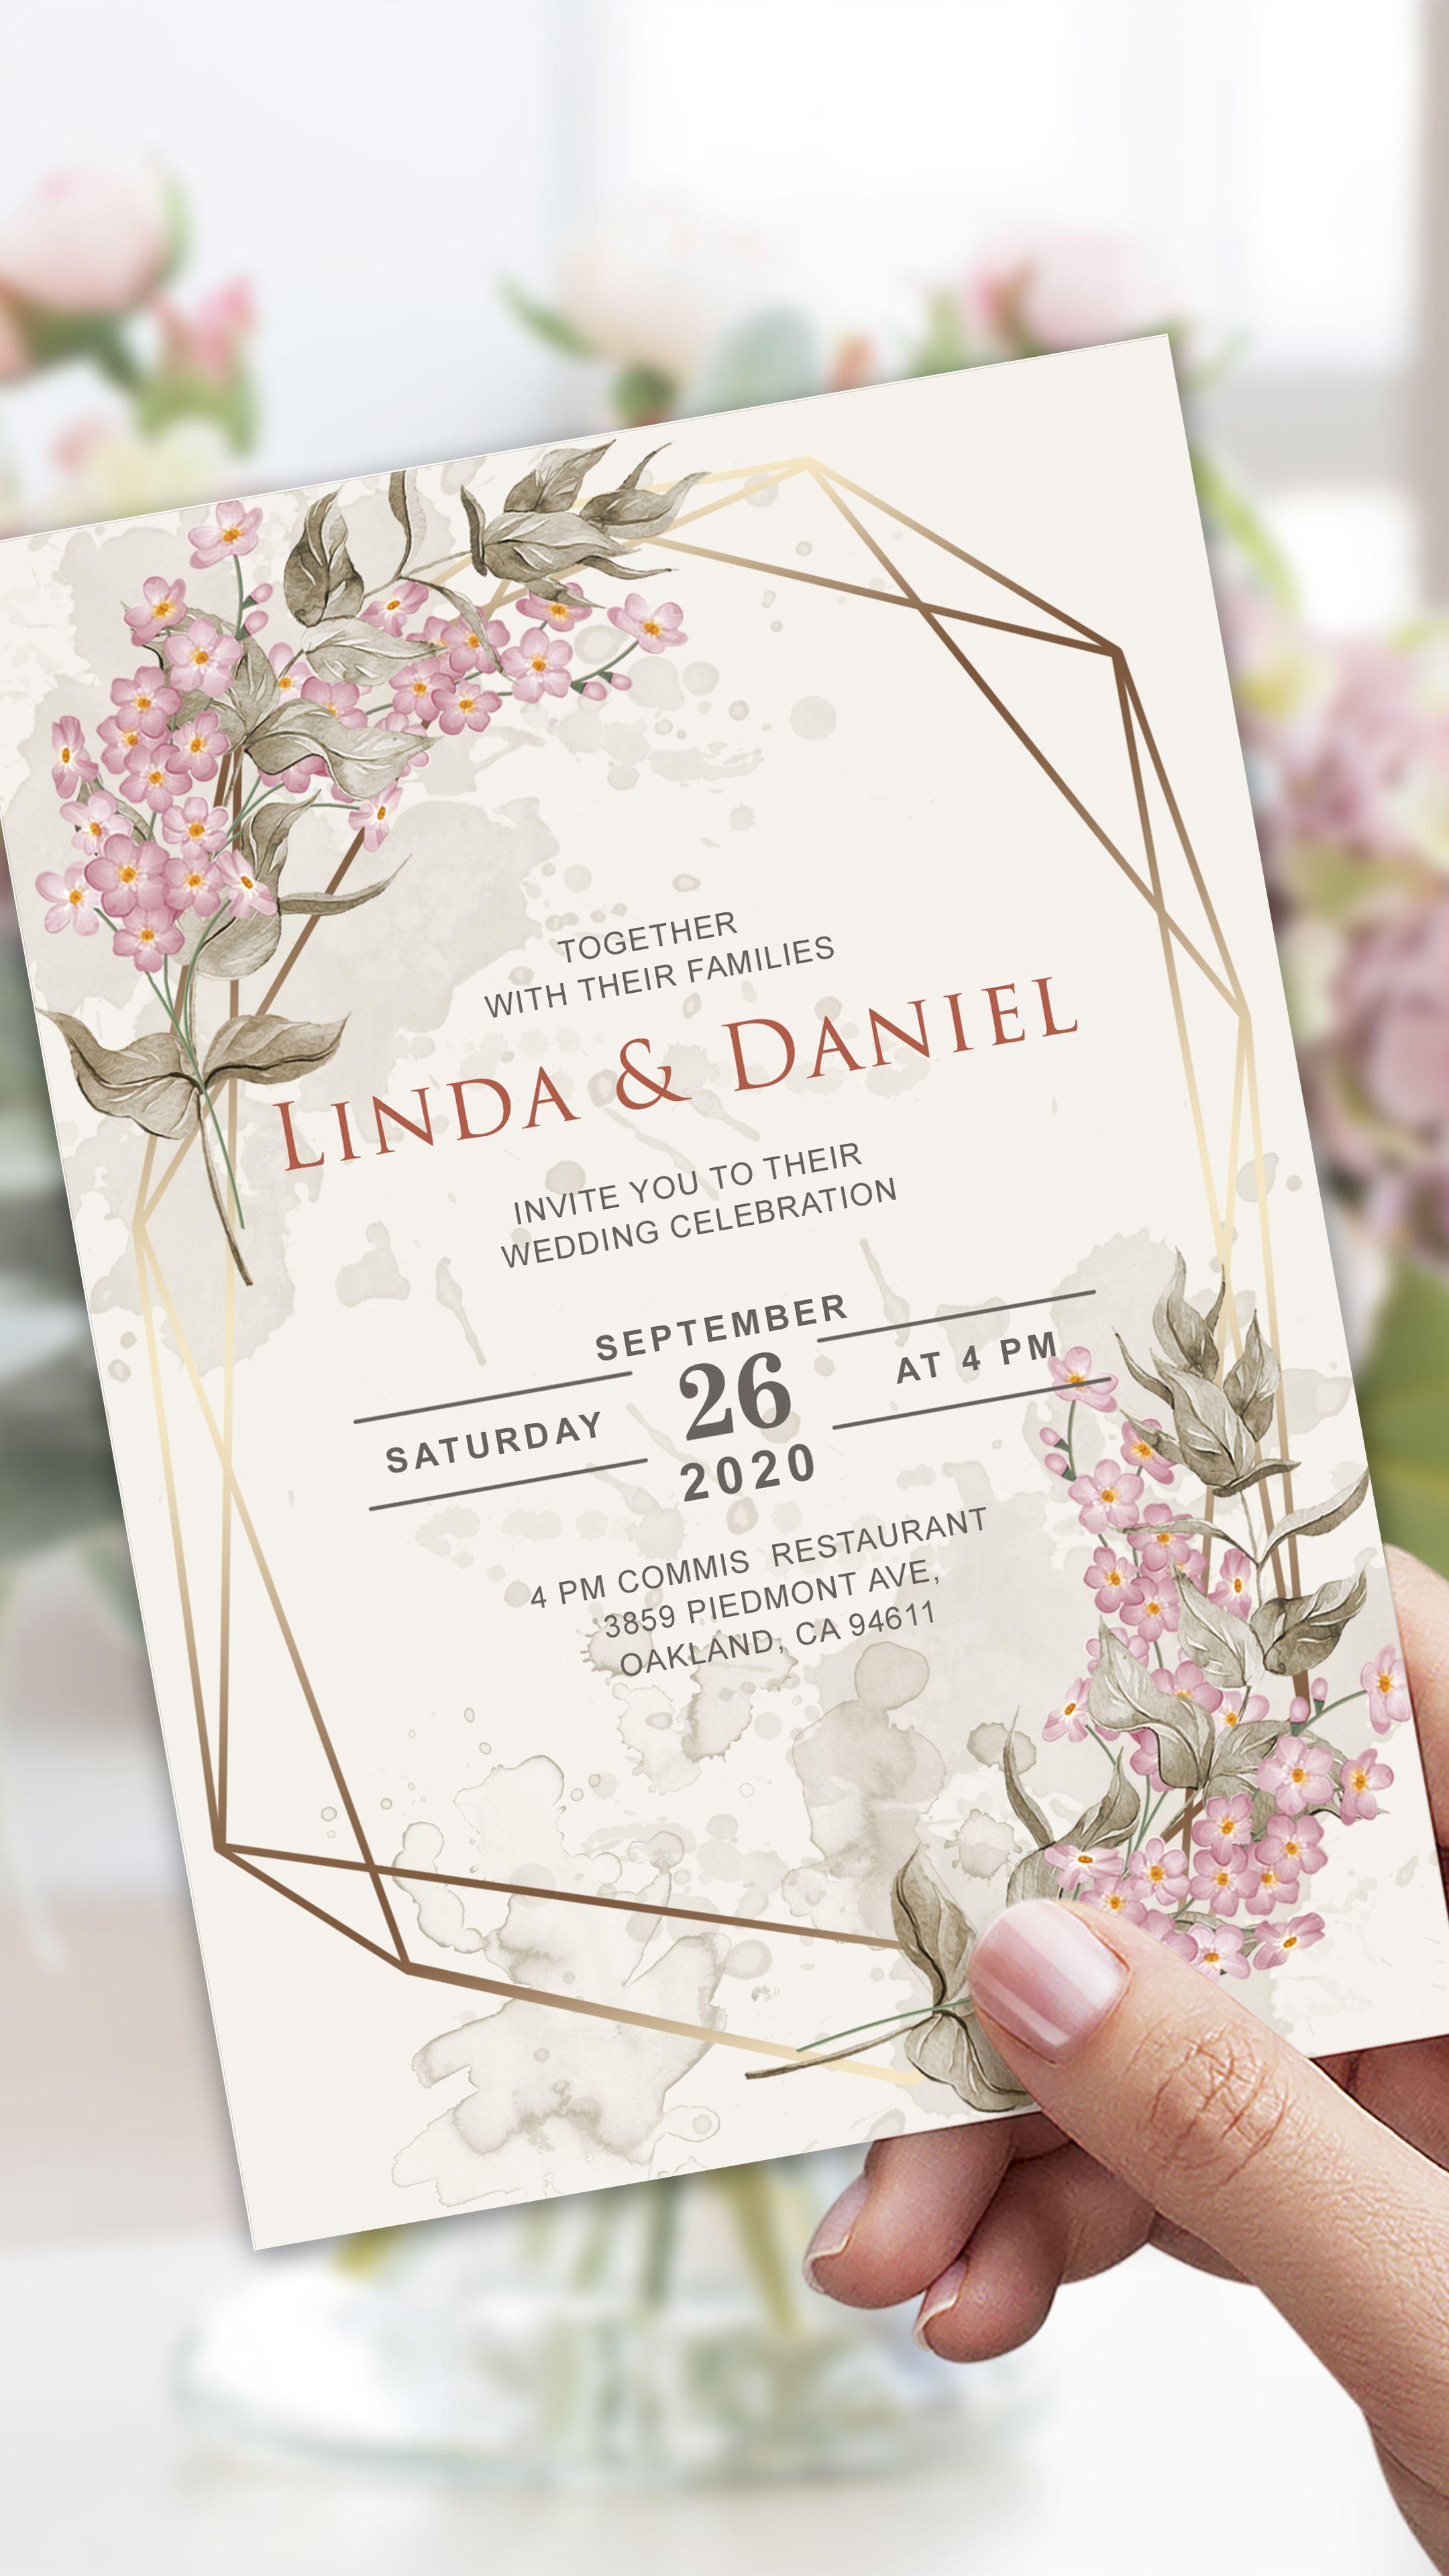 Wedding Invitation Template Botanical Wedding Invitation Floral Geometric We Wildflower Wedding Invitations Pink Wedding Invitations Wedding Invitations Boho